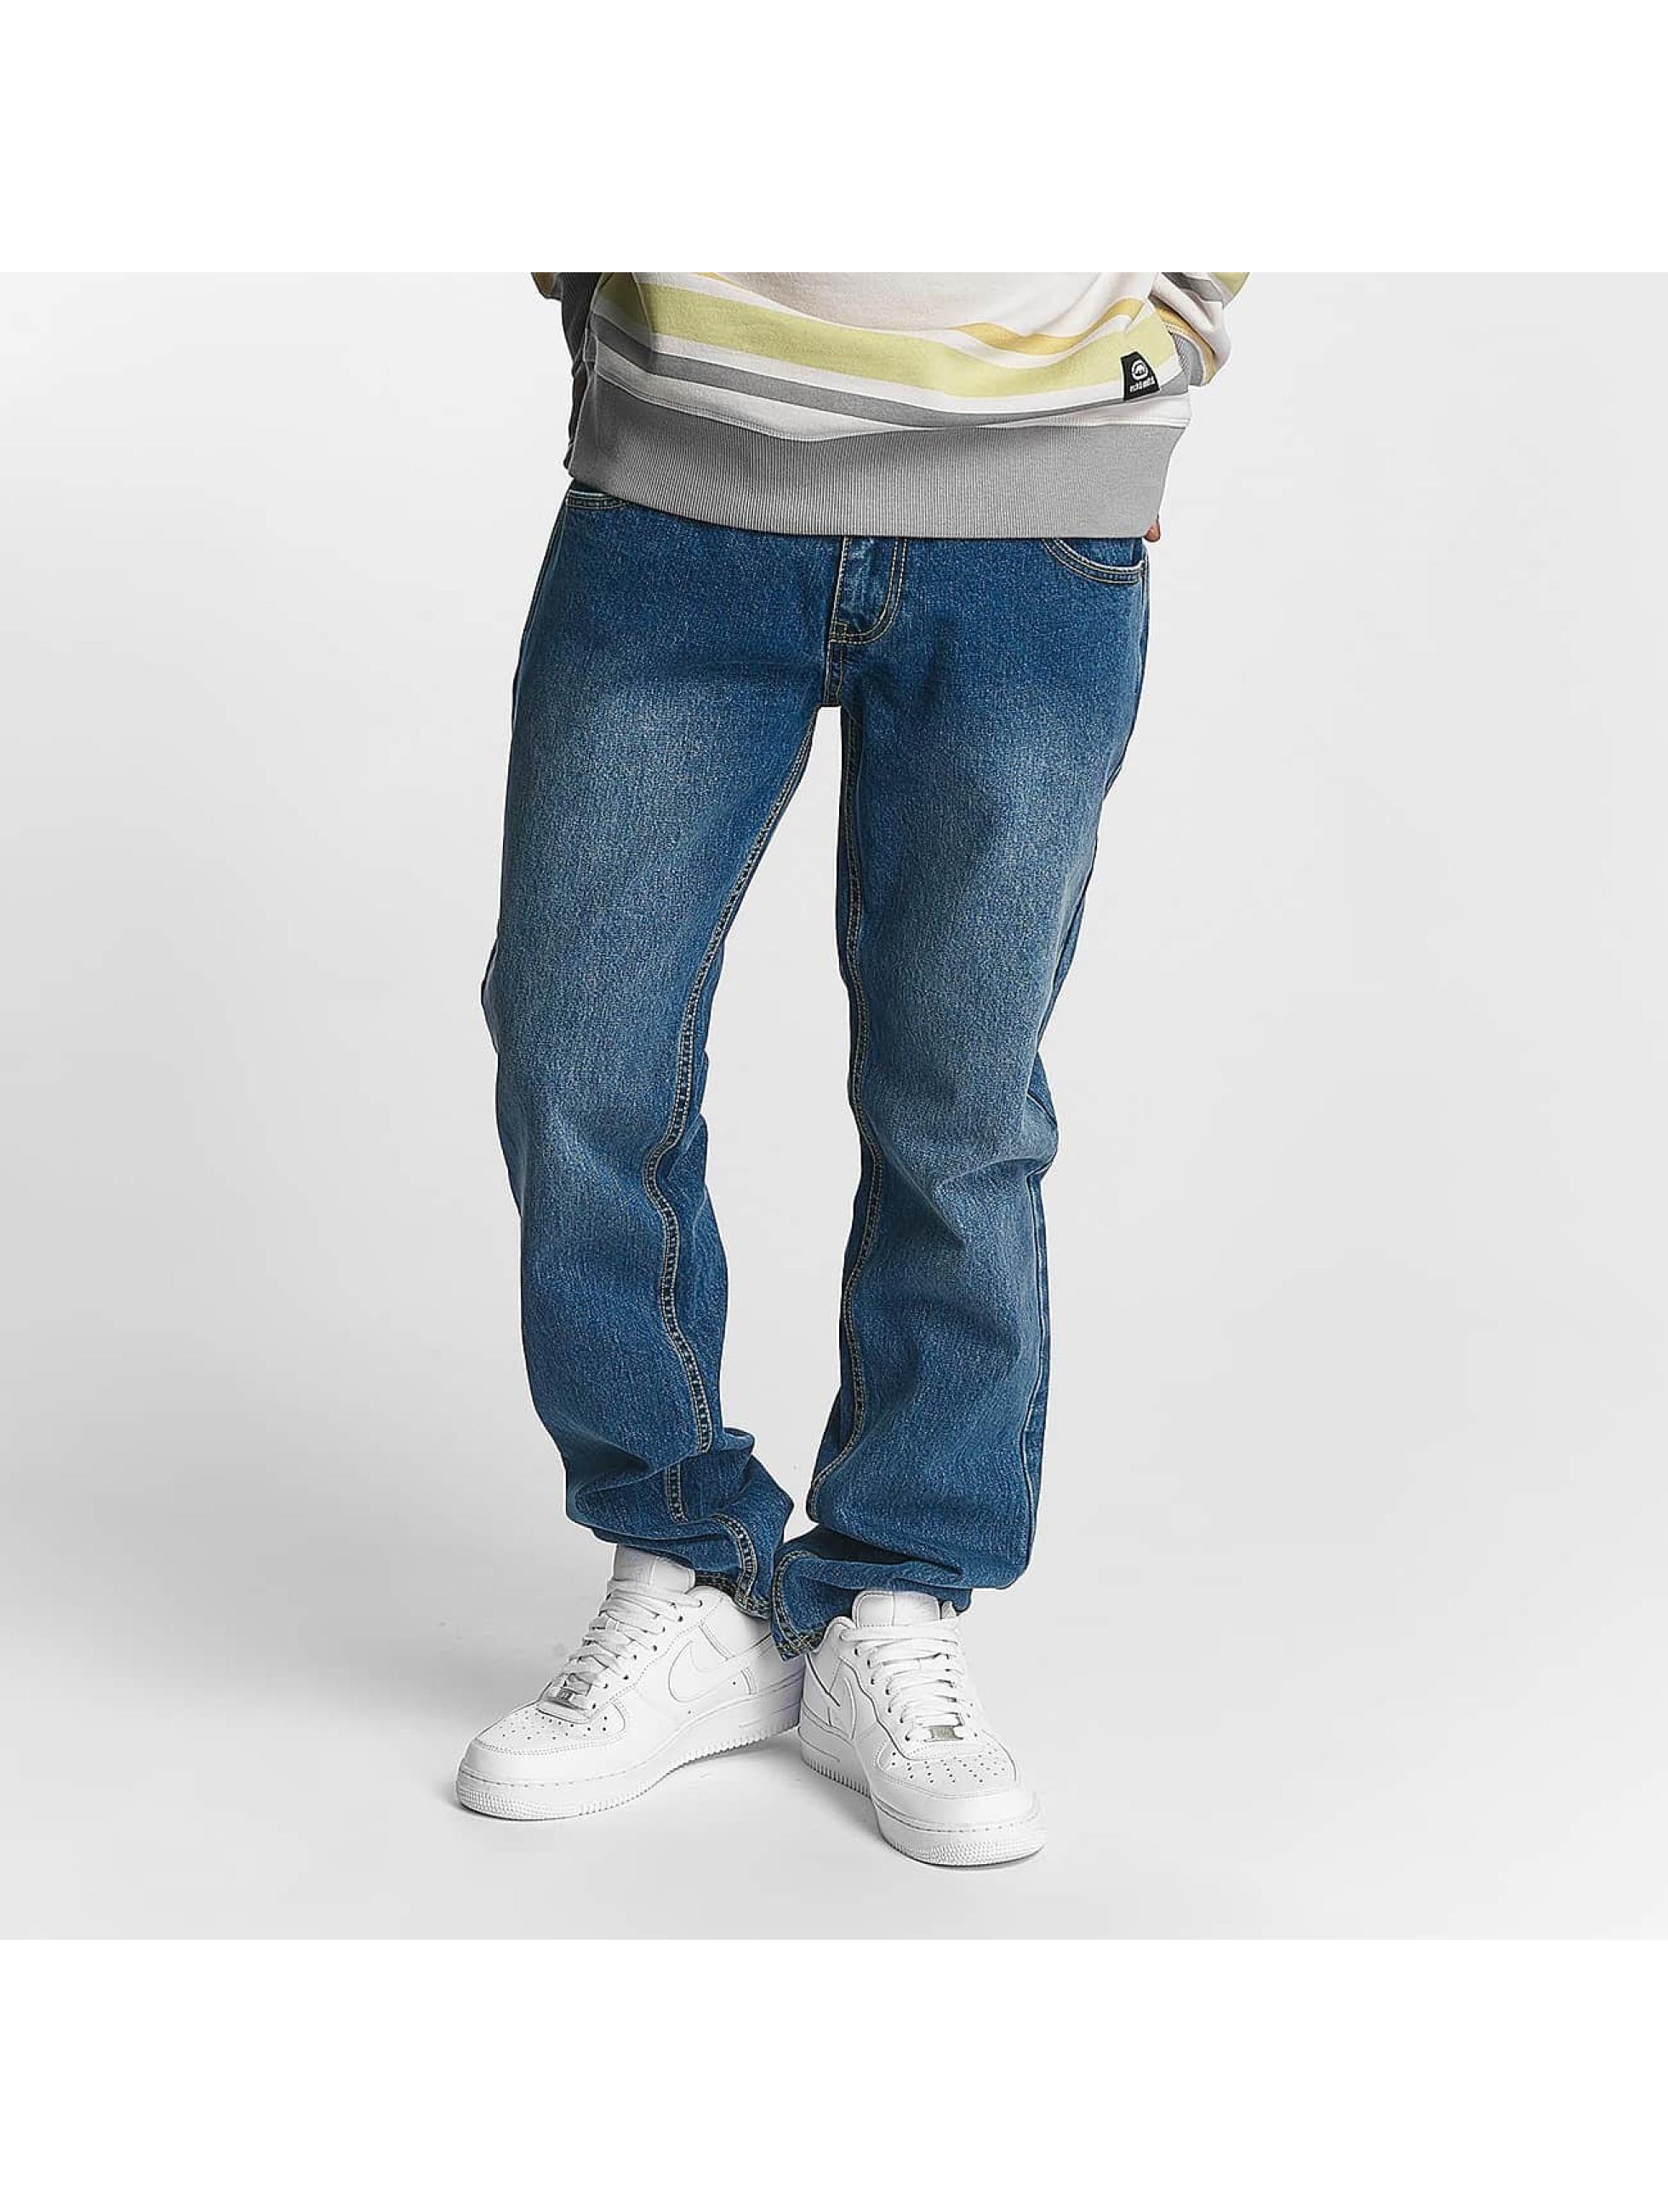 Ecko Unltd. / Straight Fit Jeans Camp's St Straight Fit in blue W 42 L 34